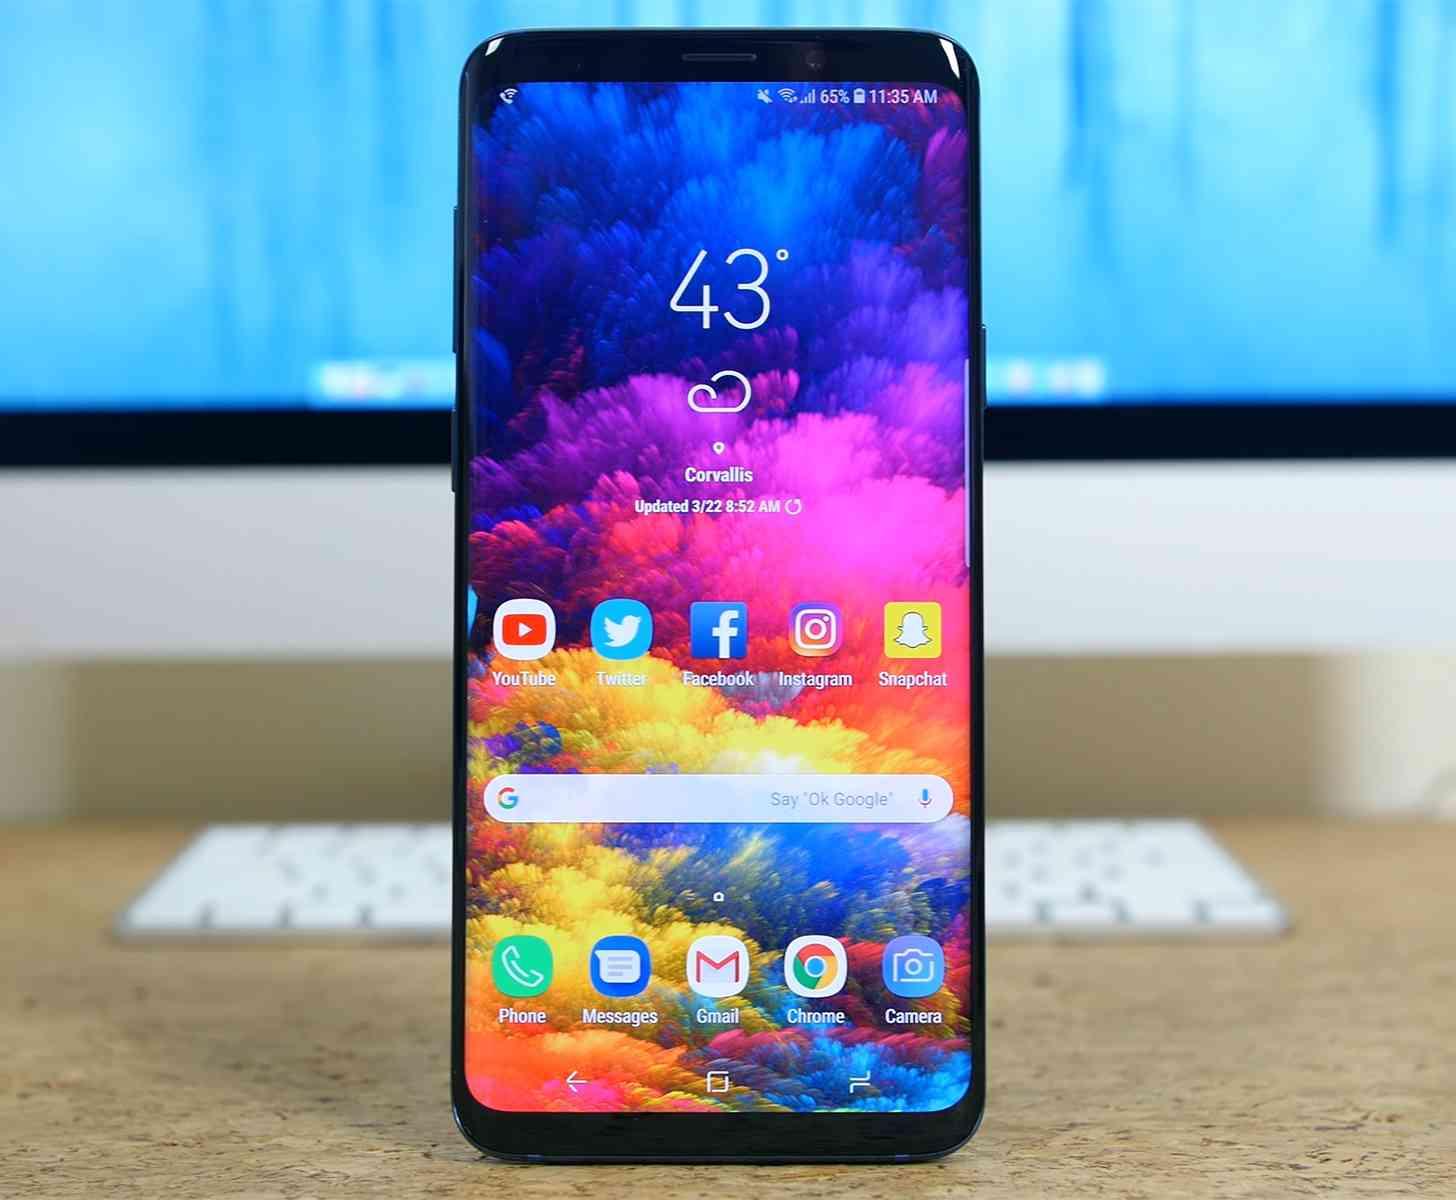 Samsung Galaxy S9+ hands-on video